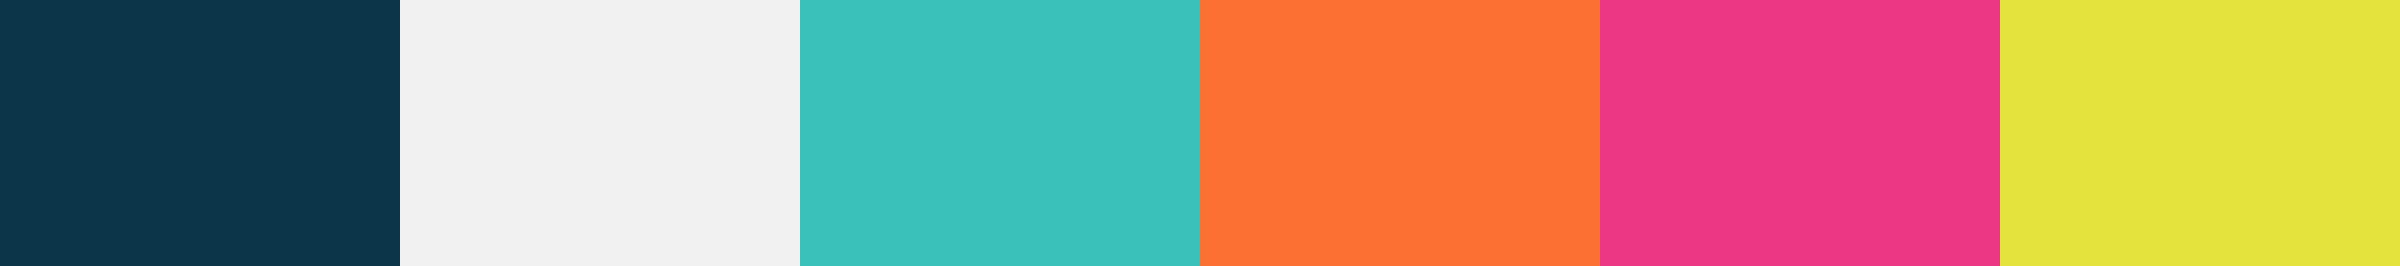 YC-palette-01